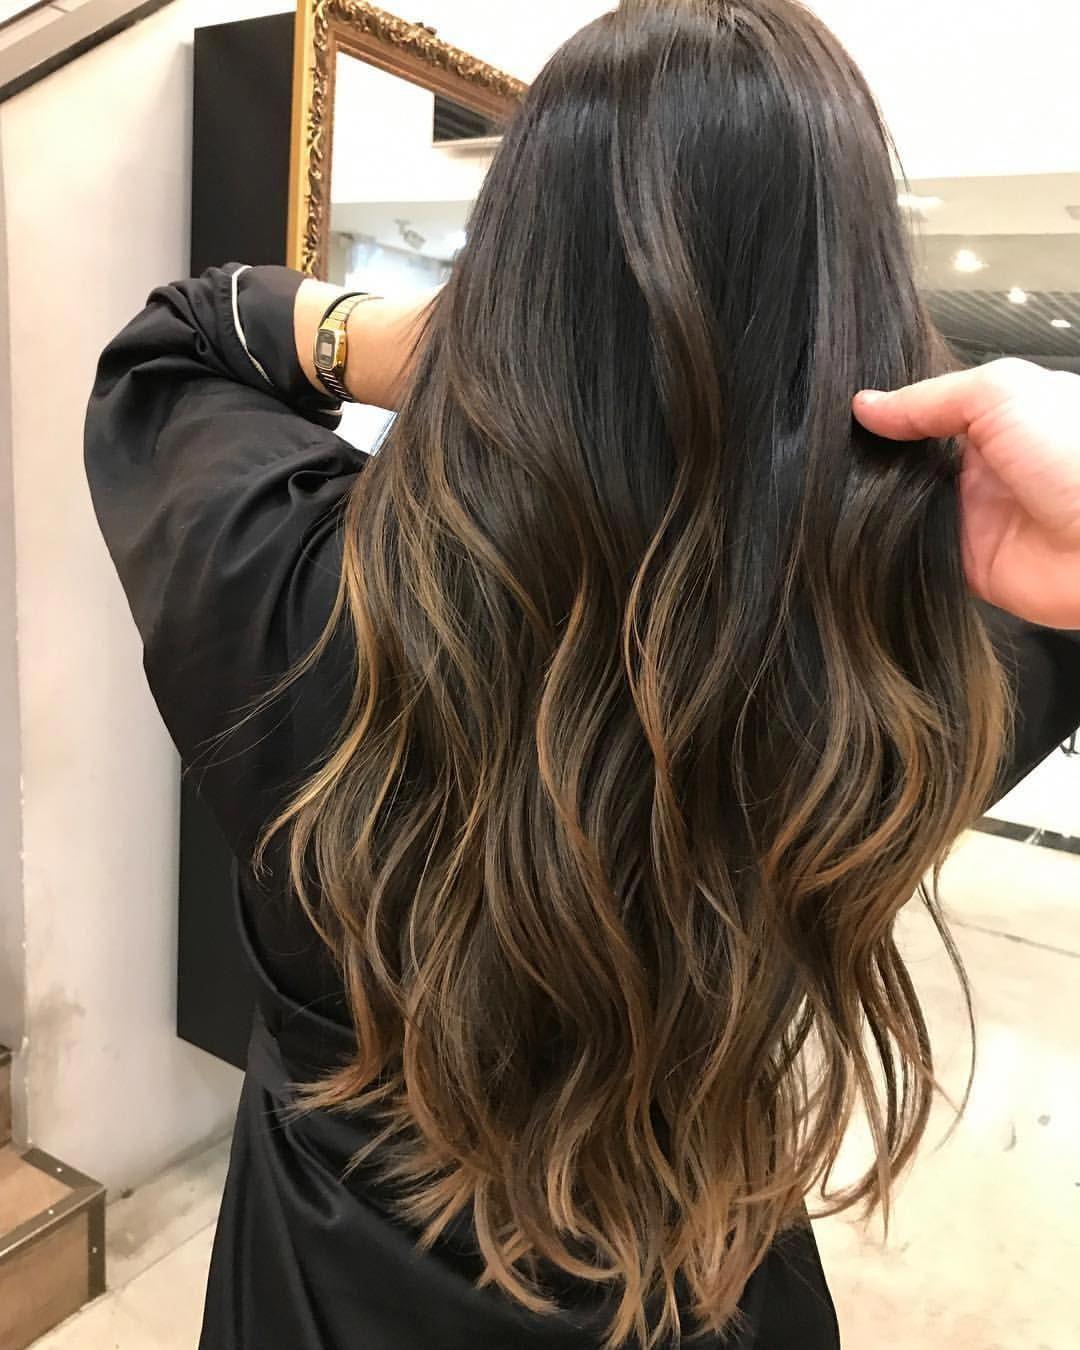 87 Unique Ombre Hair Color Ideas To Rock In 2018 Em 2020 Cabelo